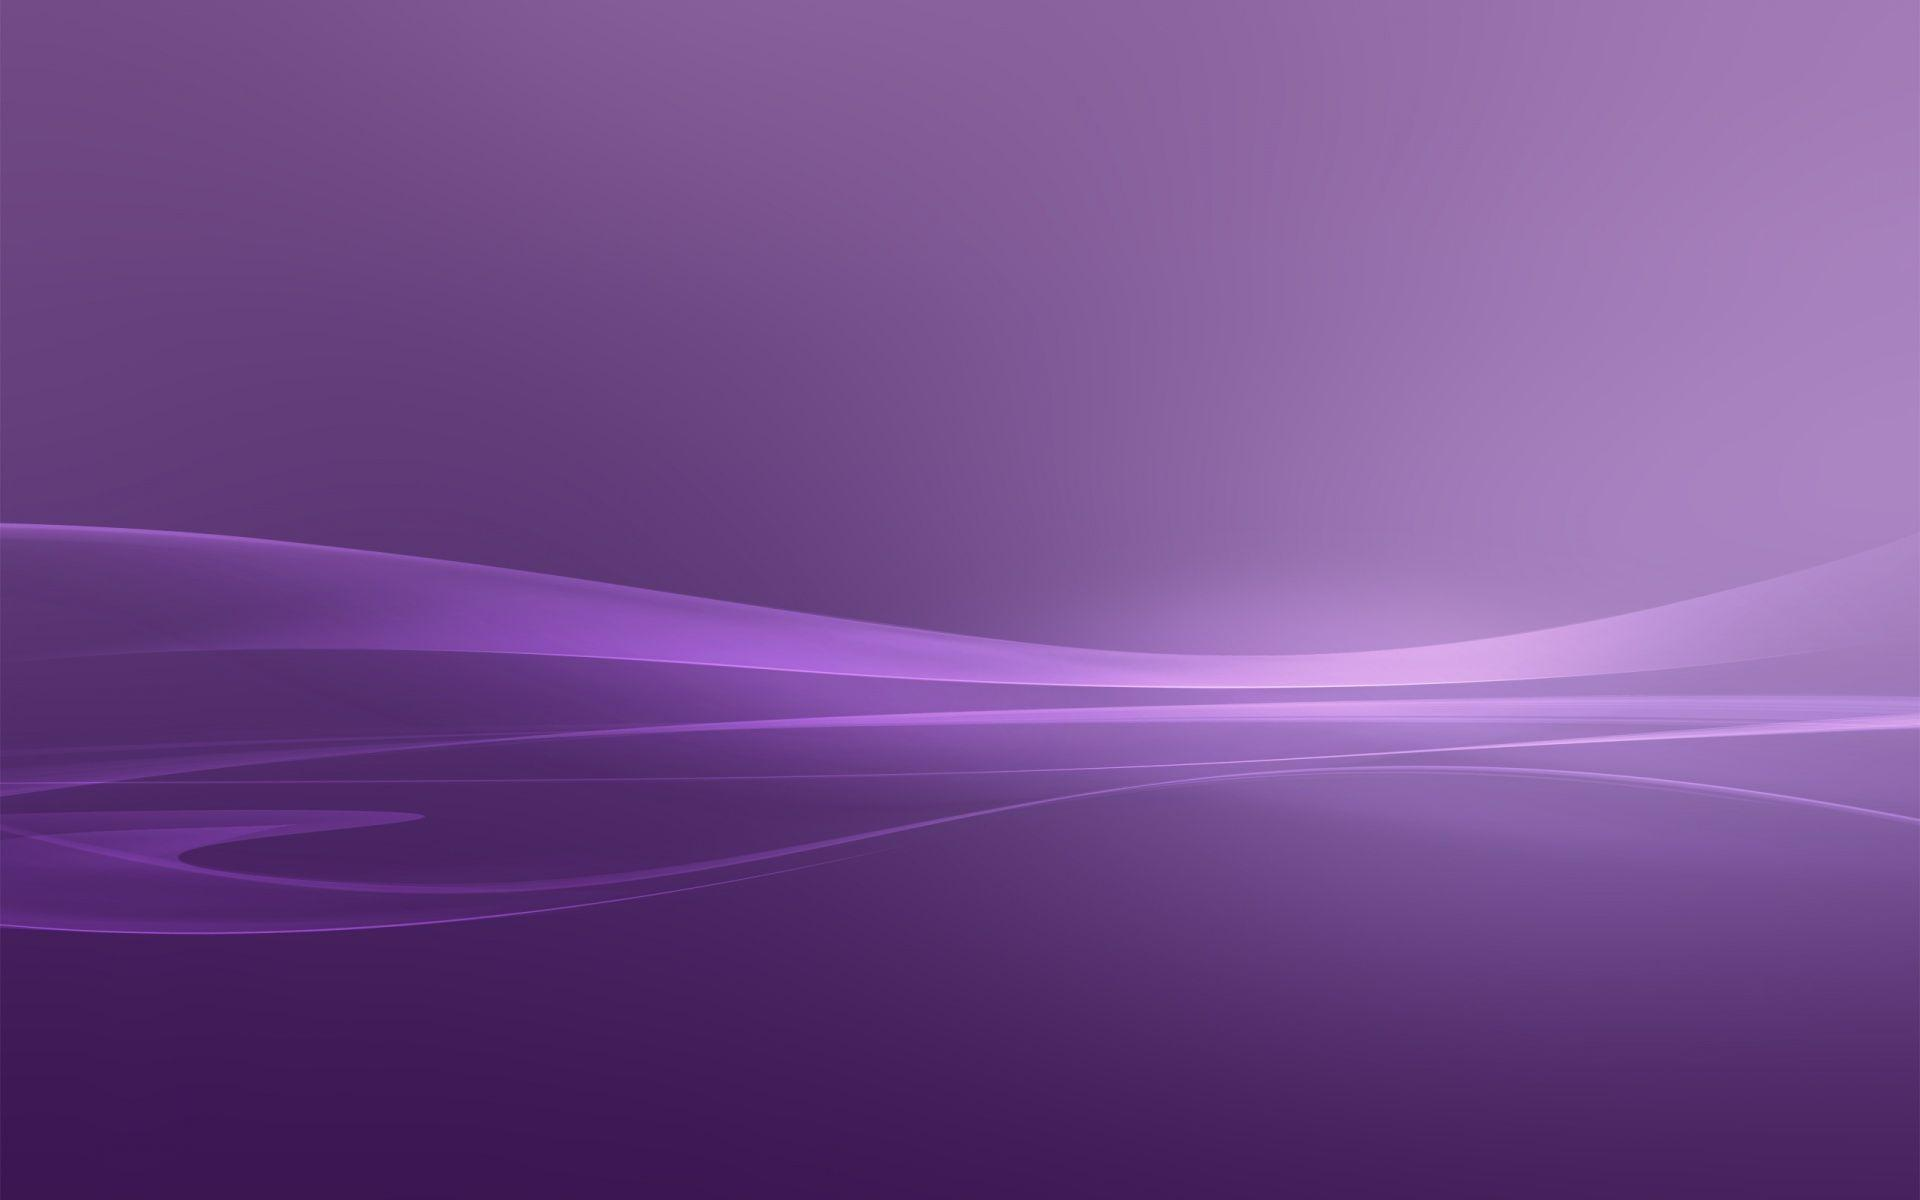 purple spidey computer wallpapers - photo #27